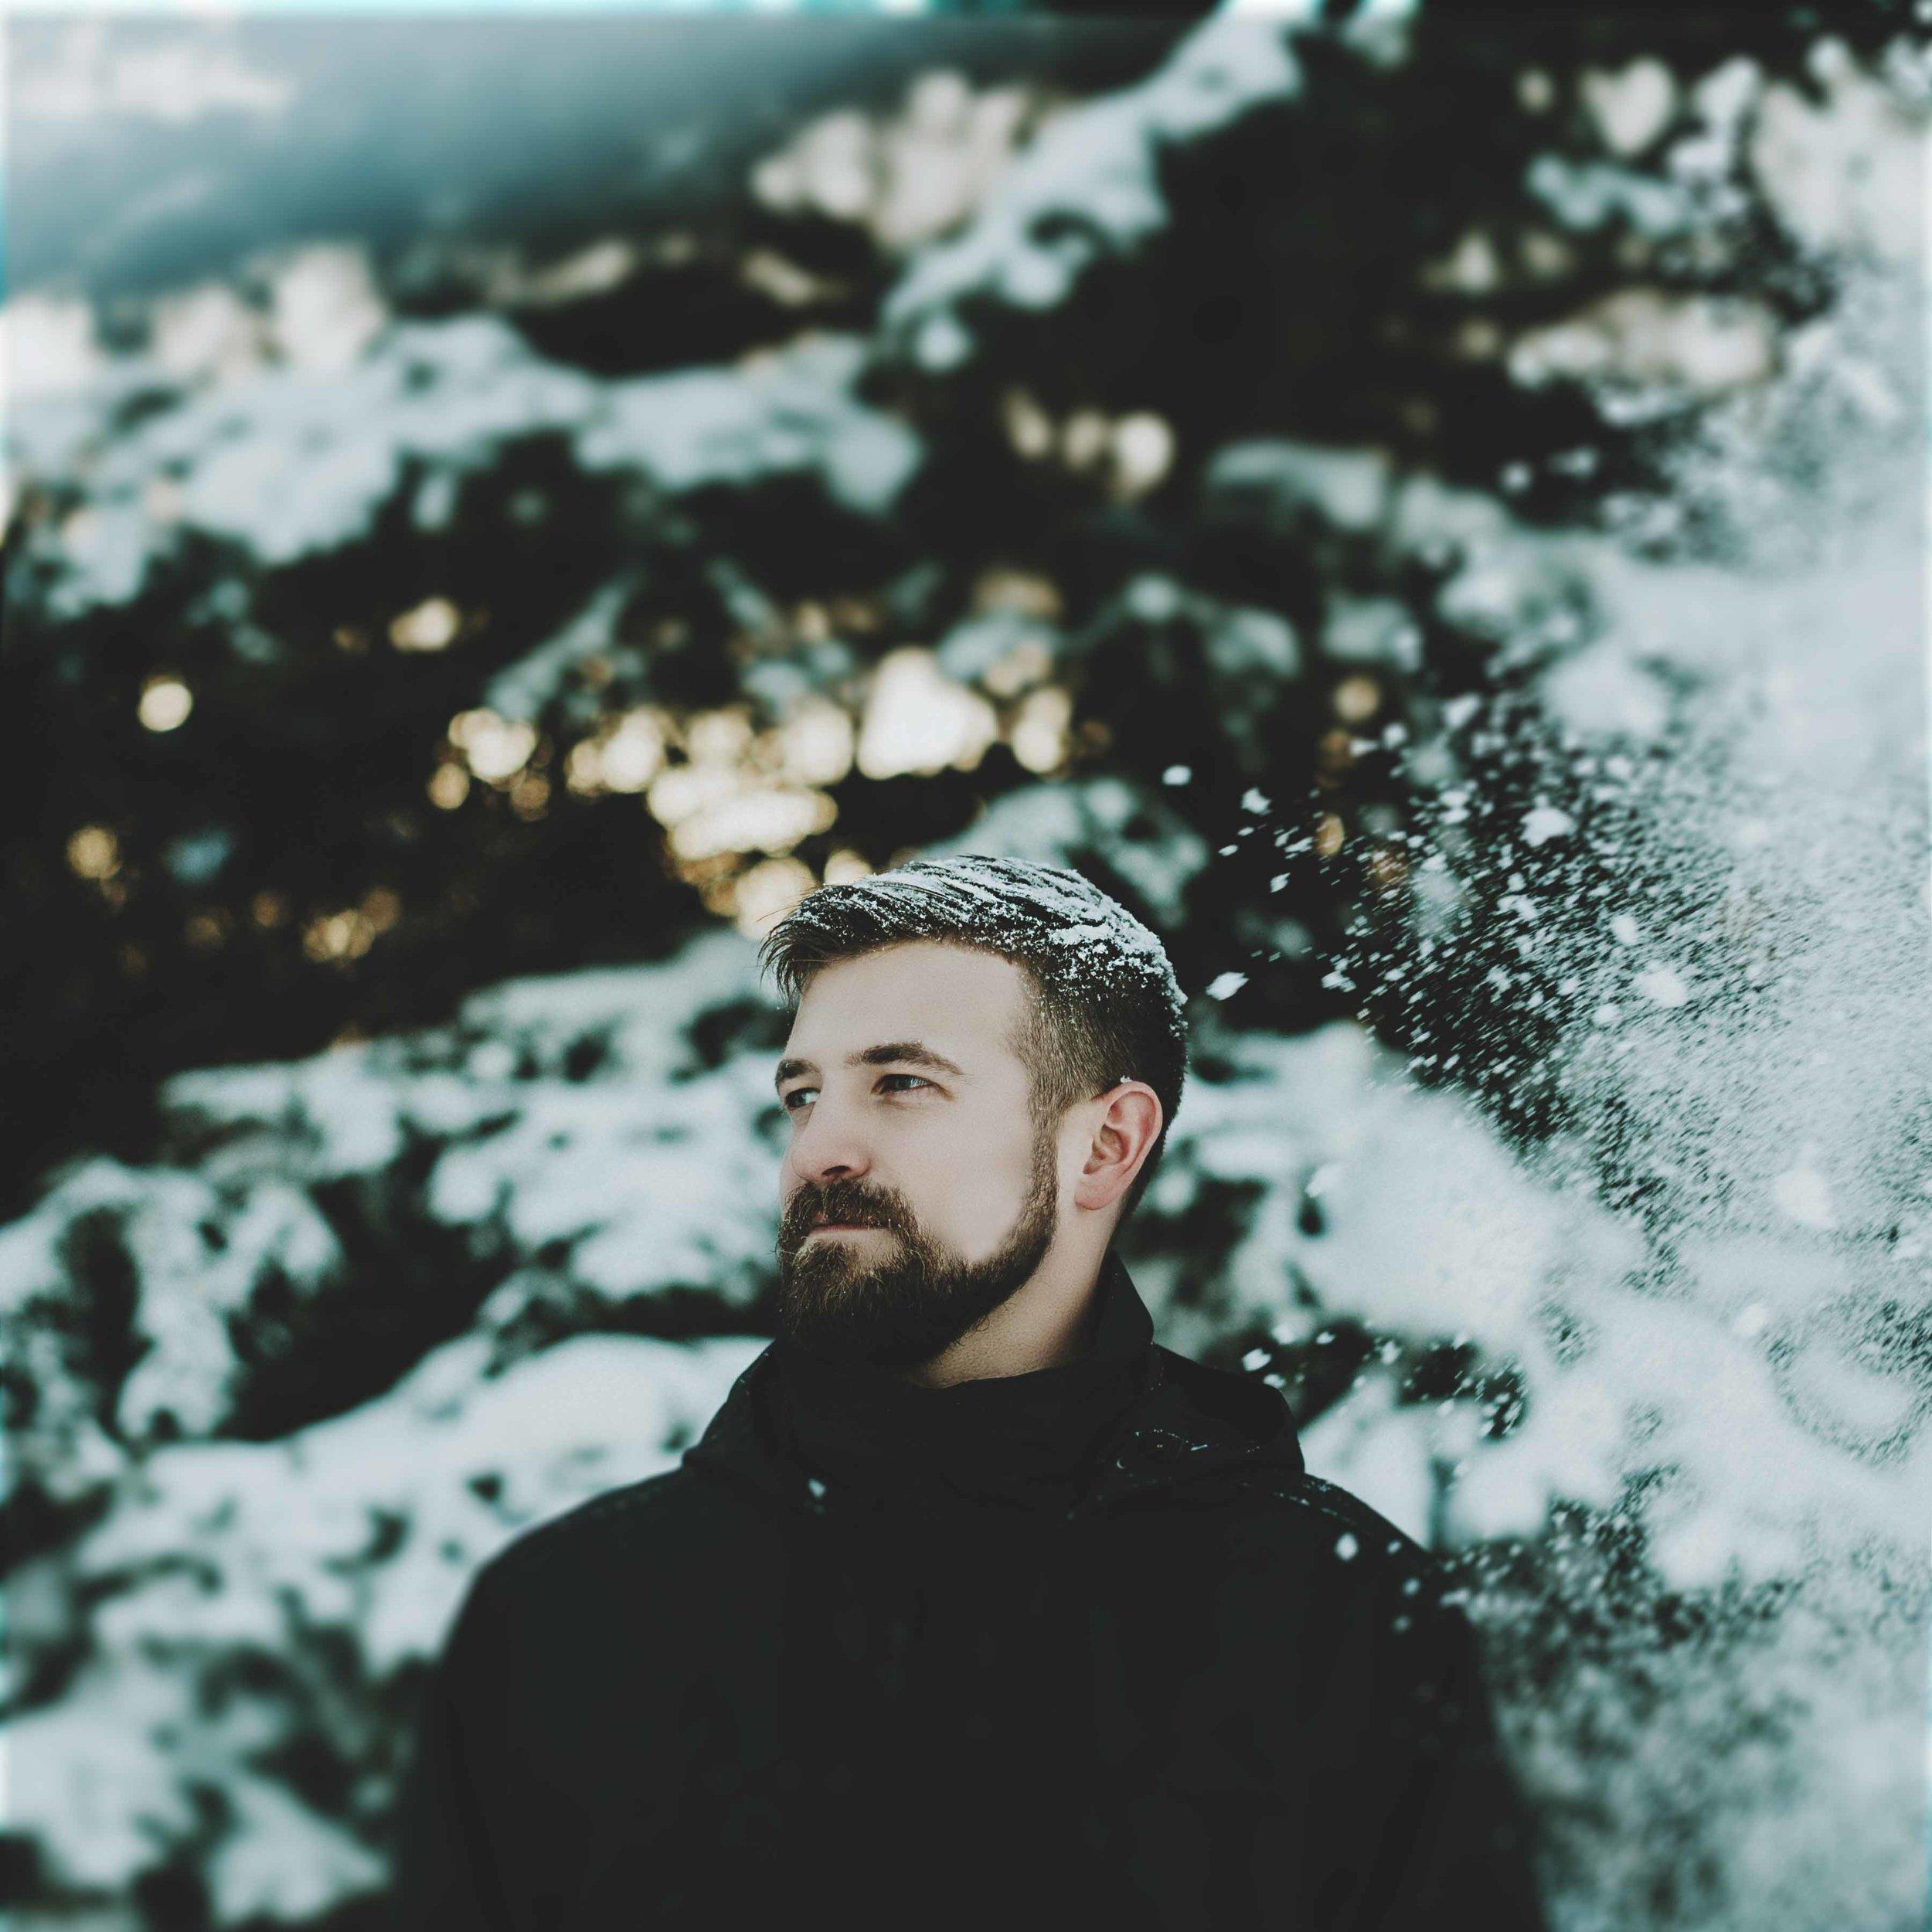 57. (Week 82) Joel Porter | Frigid [January 2017] -b&w.jpg